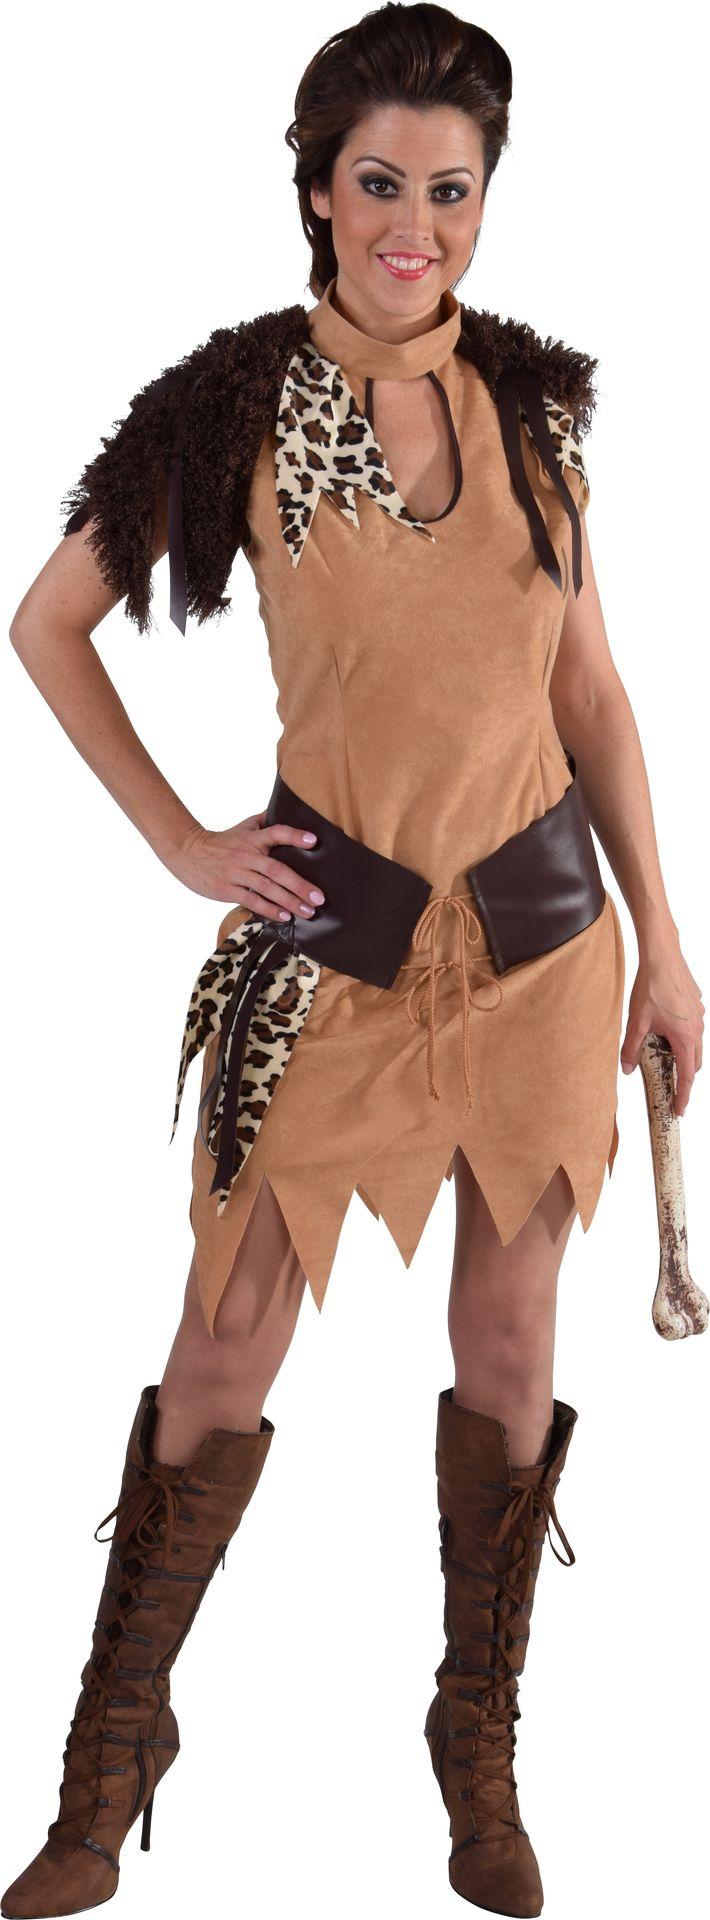 Neanderthaler jurk carnaval vrouwen